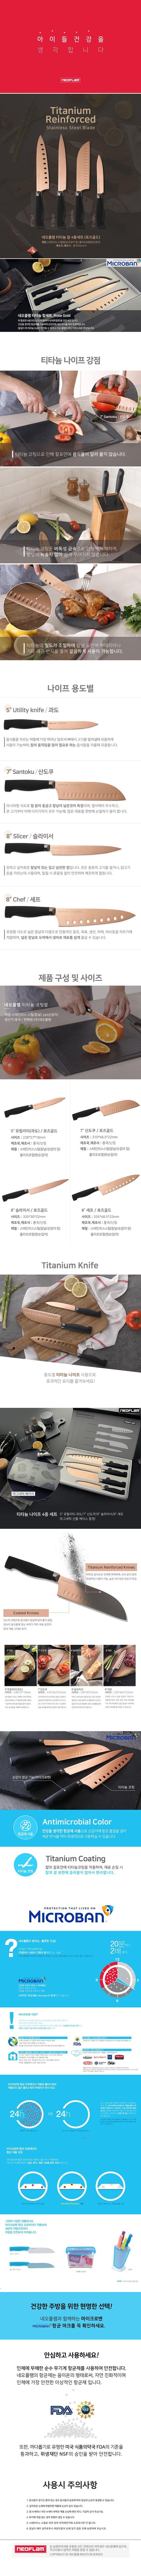 4_titanum_knife_4set.jpg